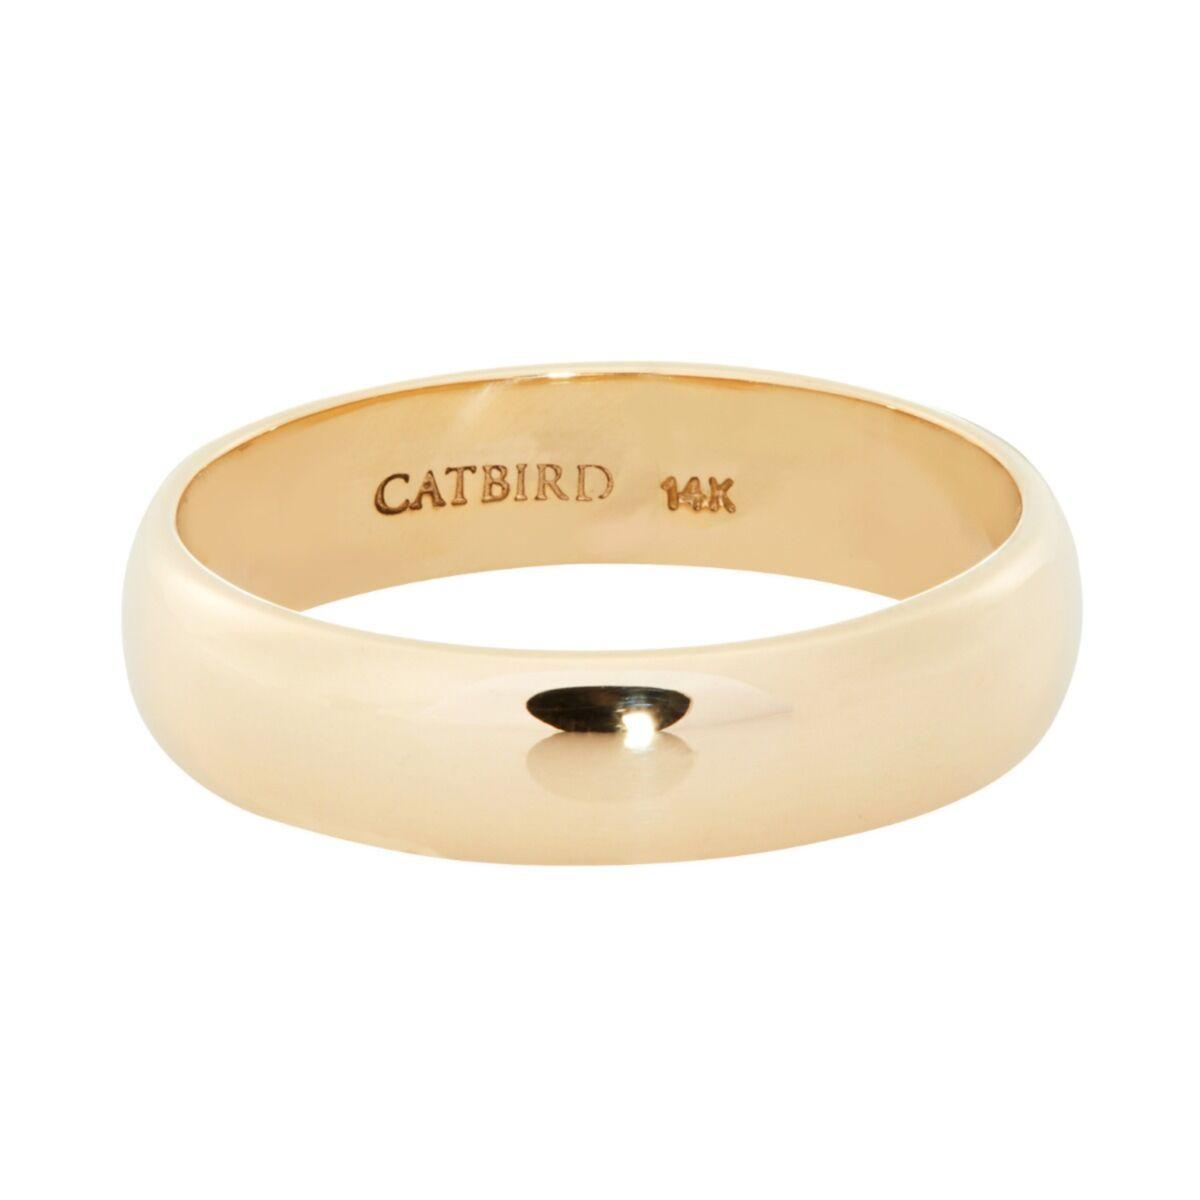 Catbird Classic Wedding Bands, Half Round Band, 4mm image